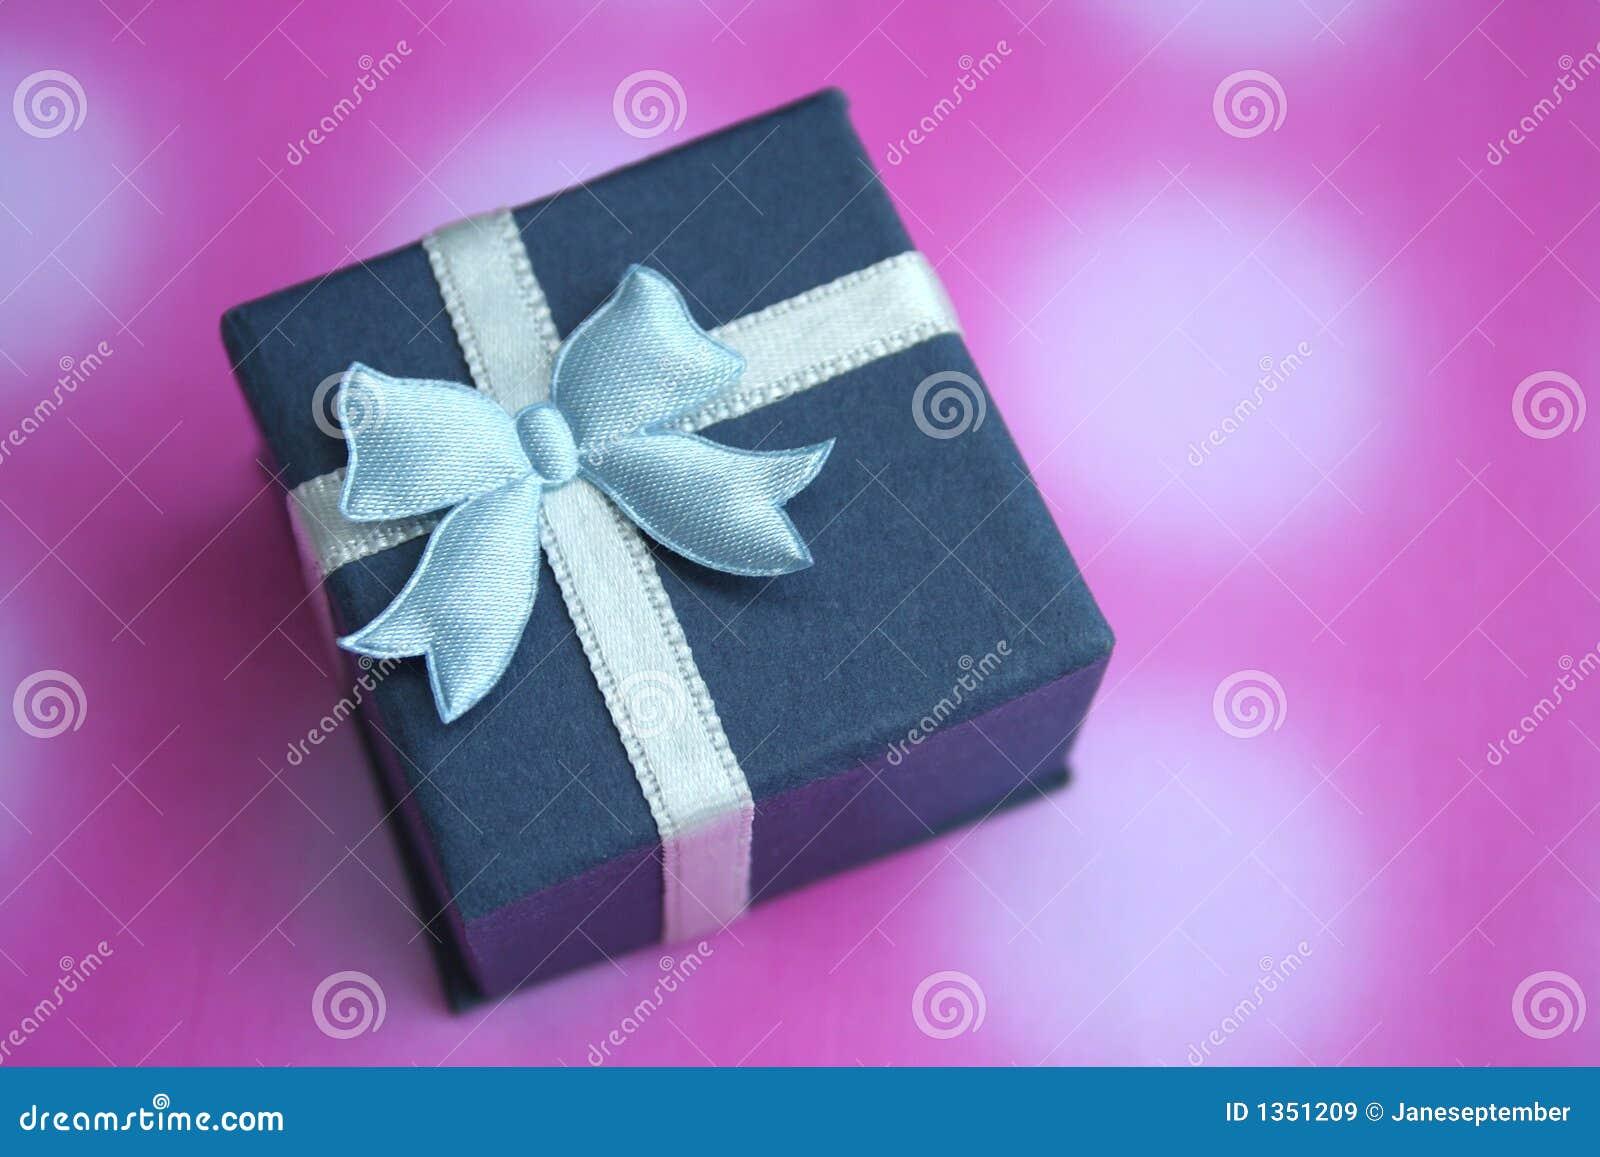 Download Present stock image. Image of beloved, blue, holiday, celebrations - 1351209